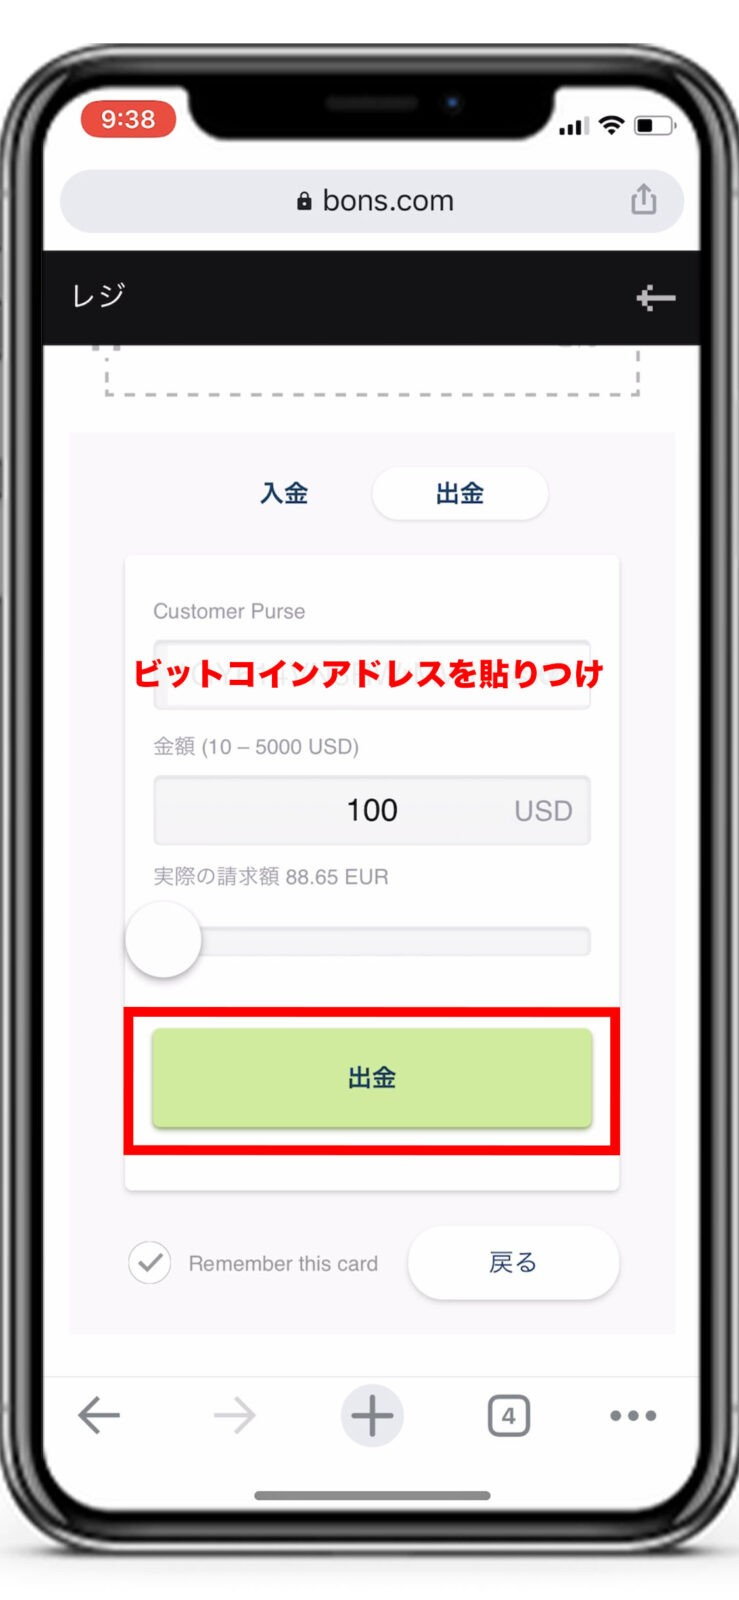 bonscasino_payment24